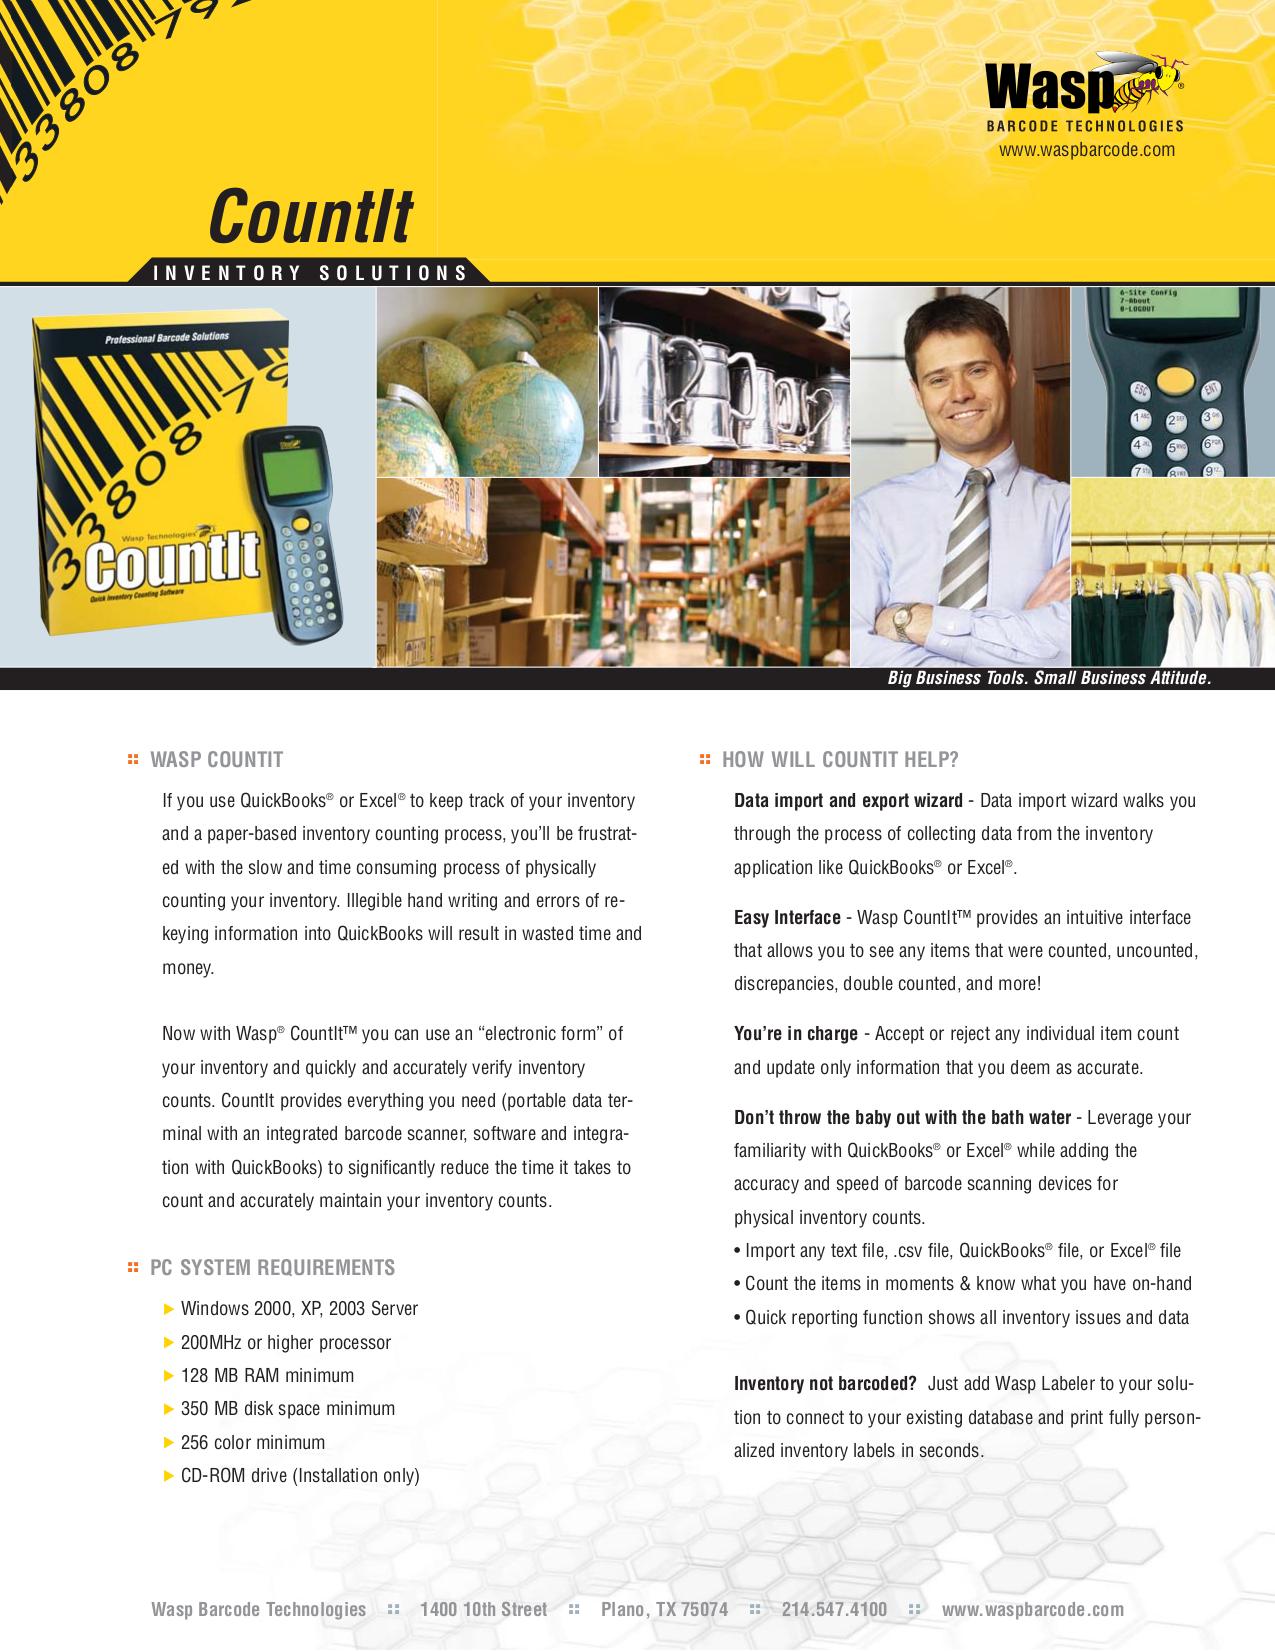 pdf for Wasp Printer WPL330 manual